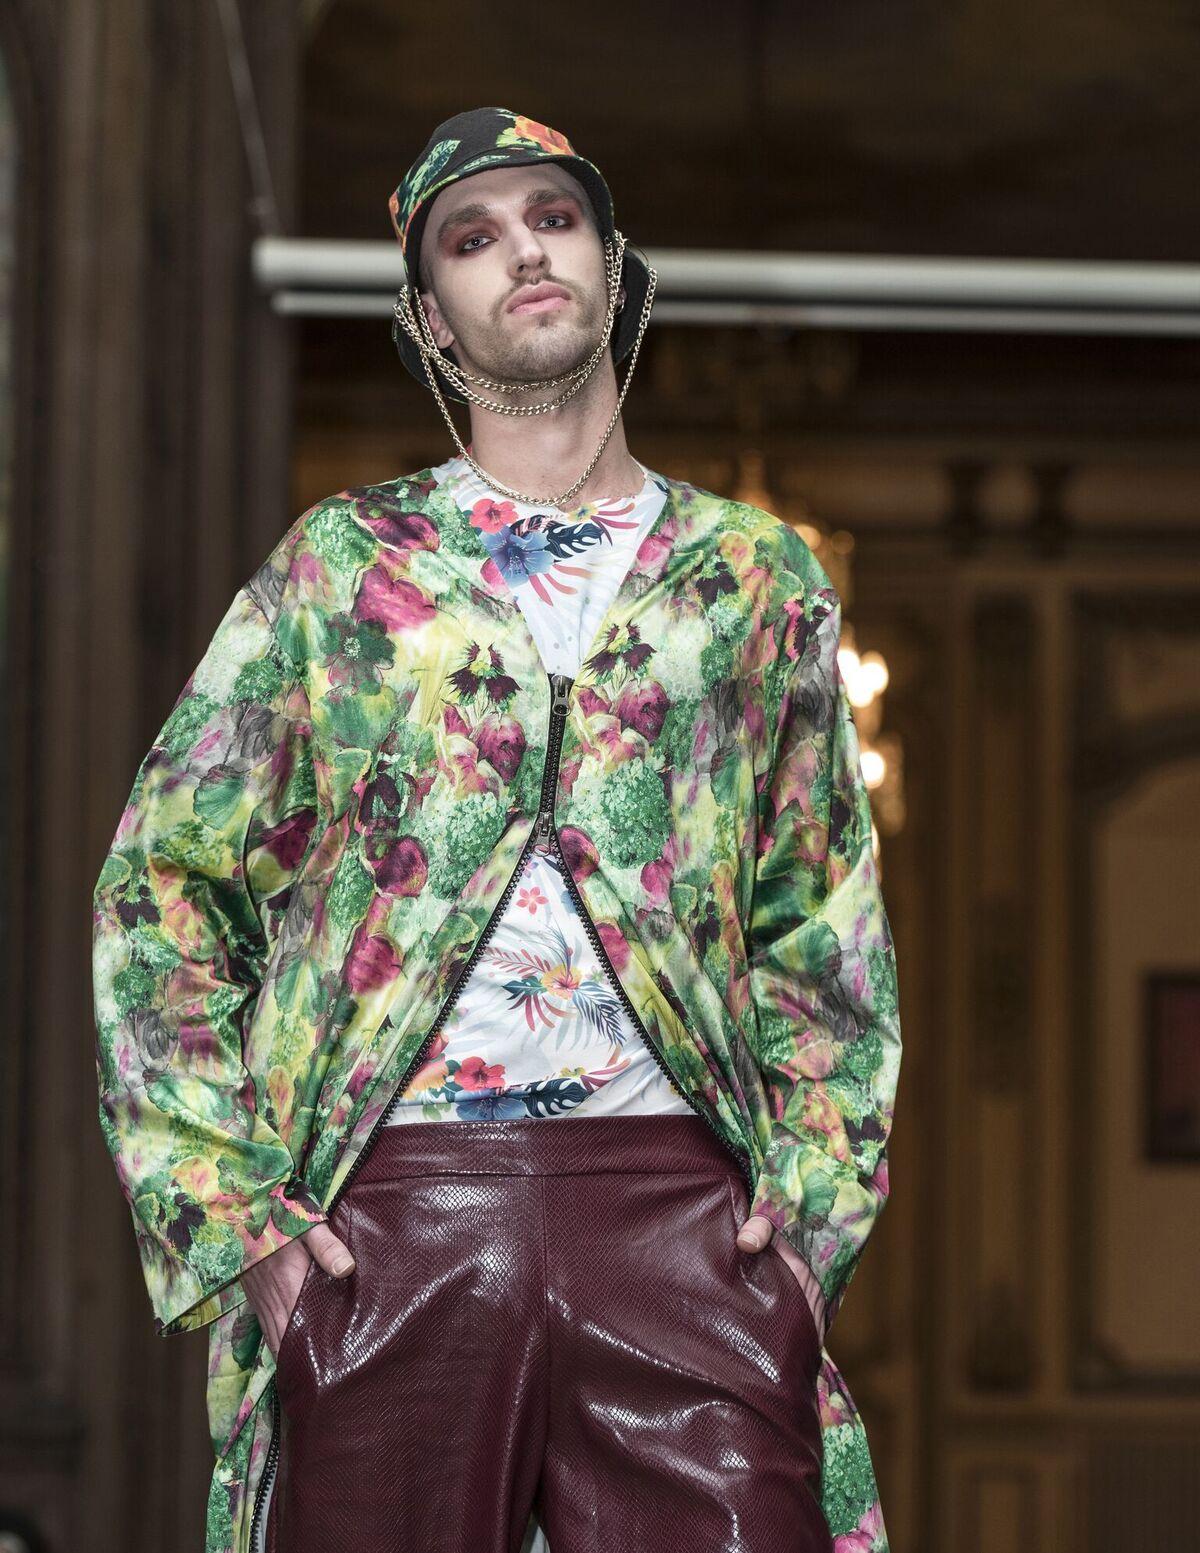 Shaleva freedom ss20 during paris fashion week (4)